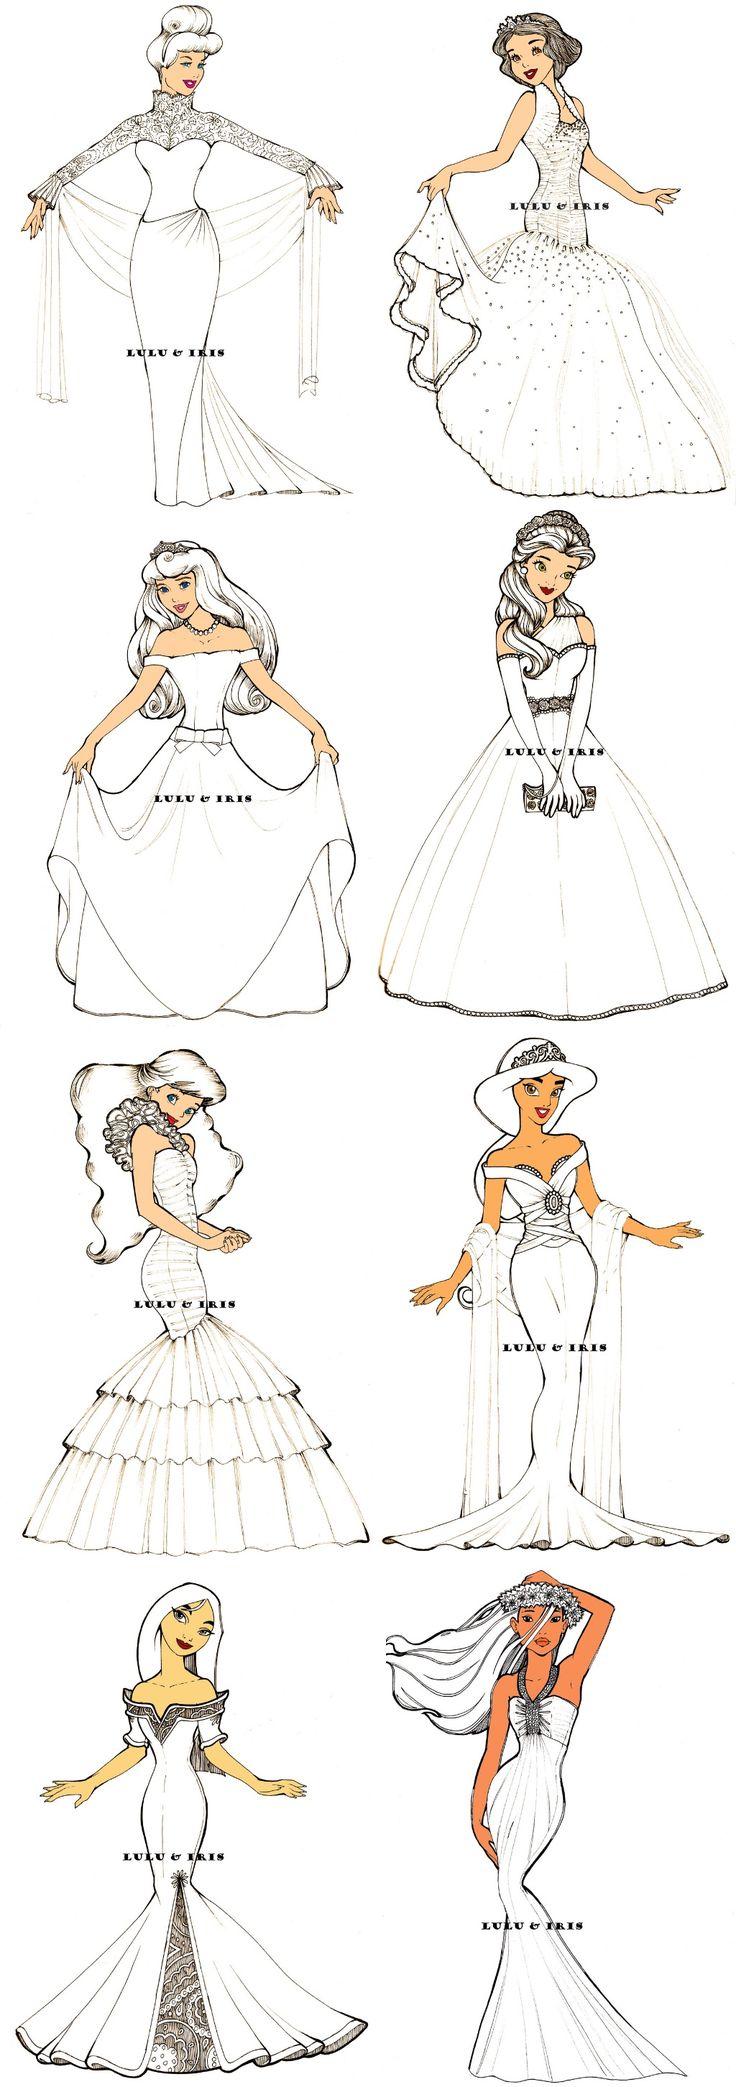 Disney Princess Wedding Dresses By Lulu Ibeh On Oh I ADORE Snow Whites